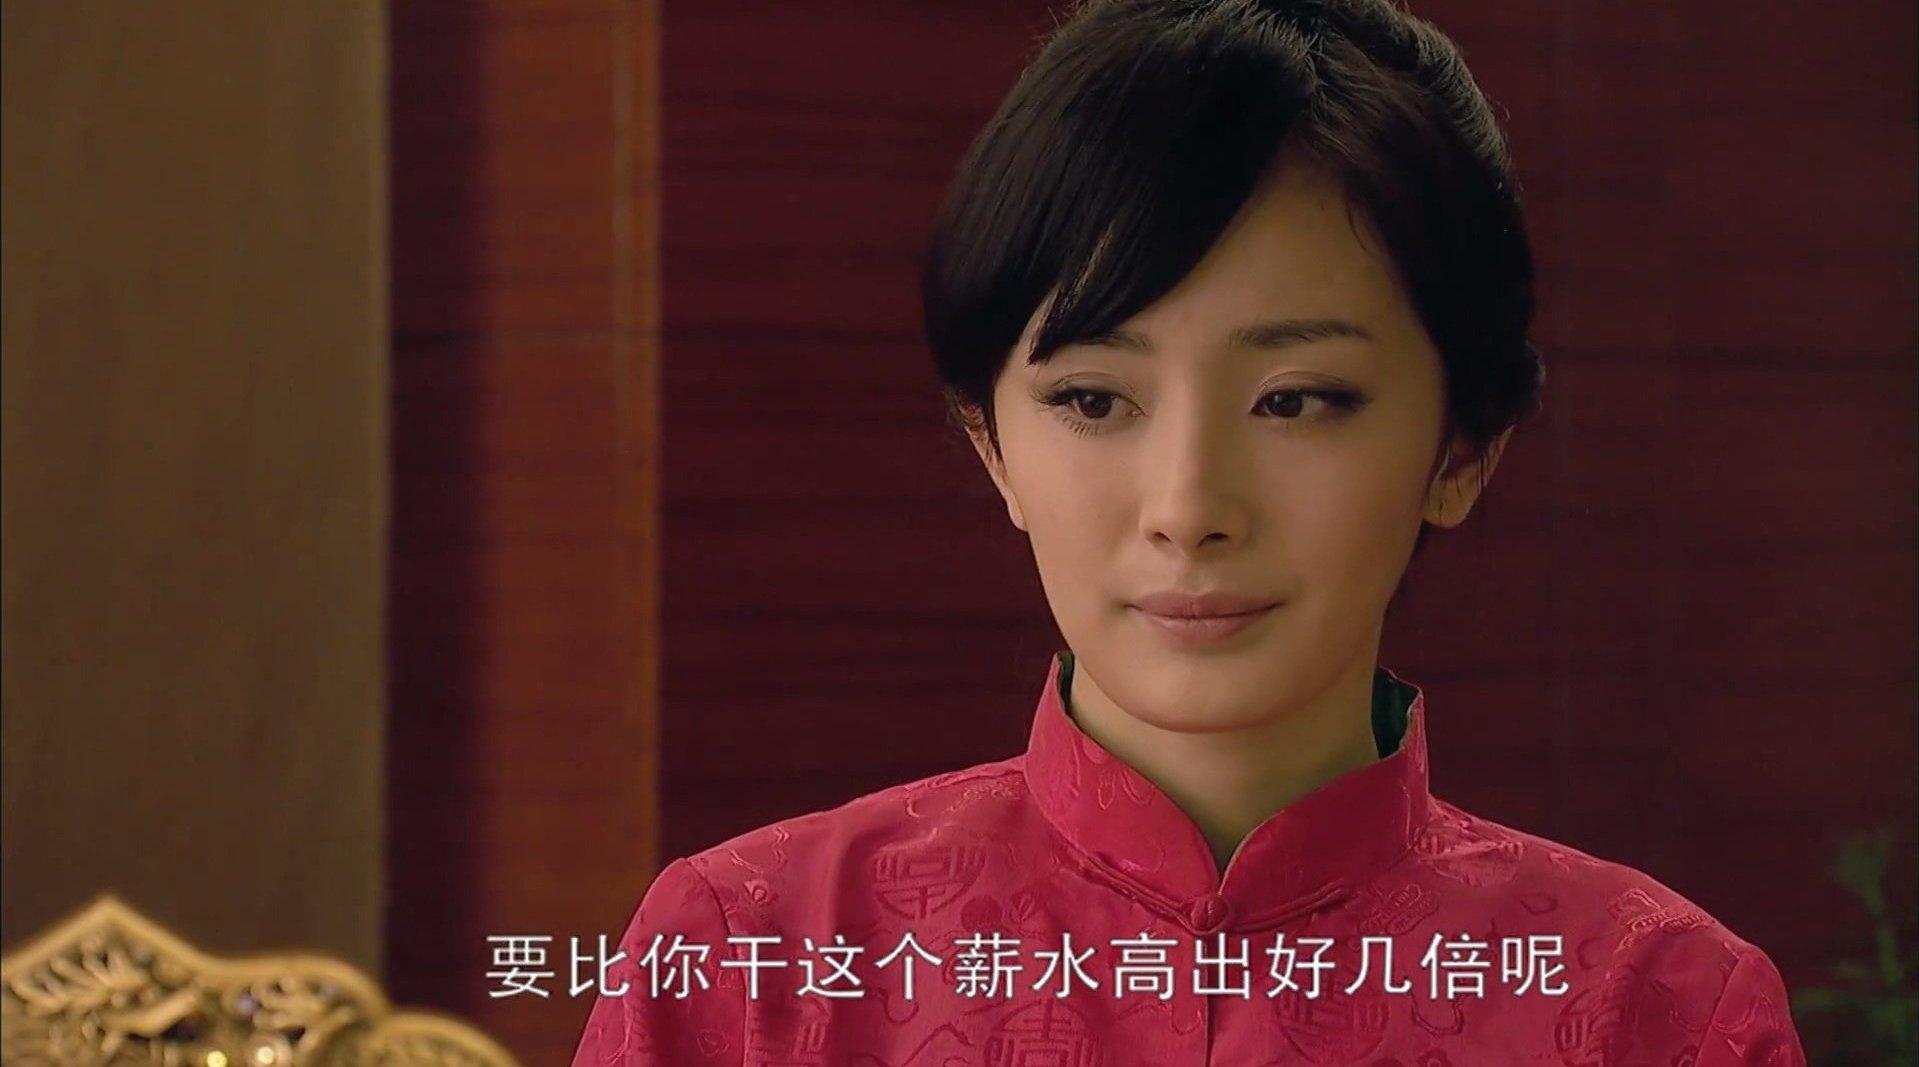 Day81  《北京爱情故事》杨幂杨紫曦cut 第33、34 37集 大结局前篇3